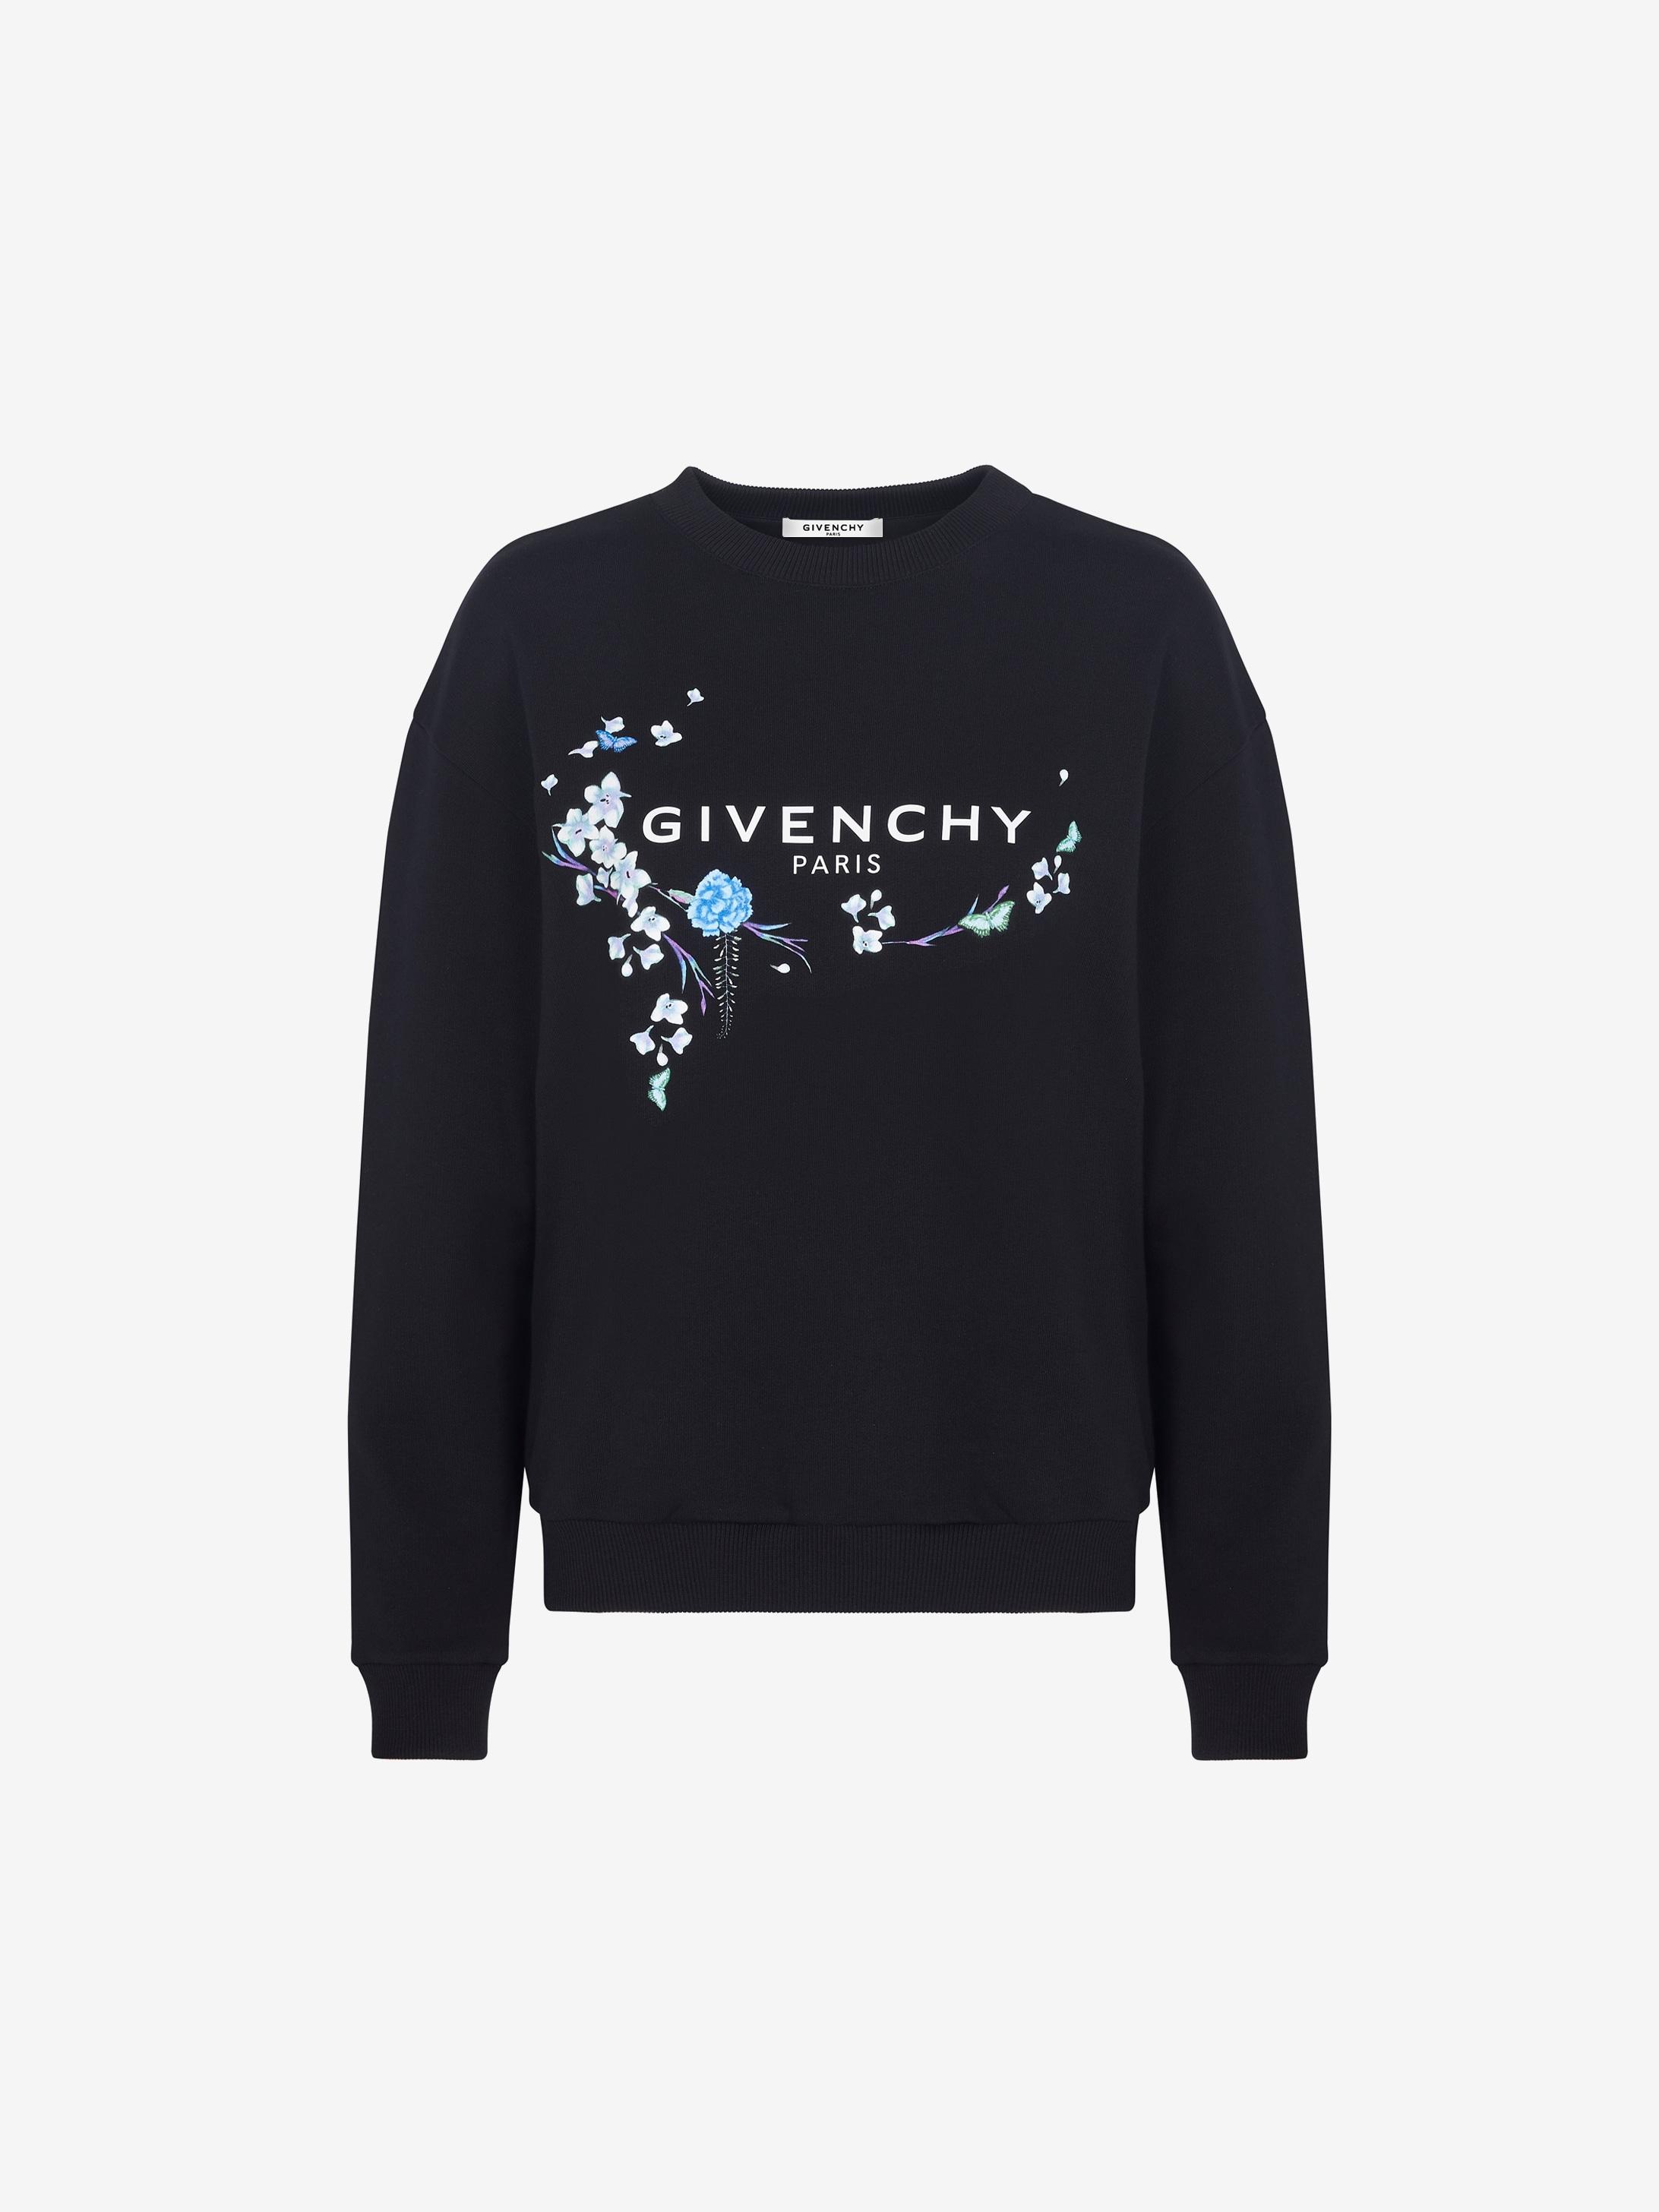 GIVENCHY floral printed sweatshirt